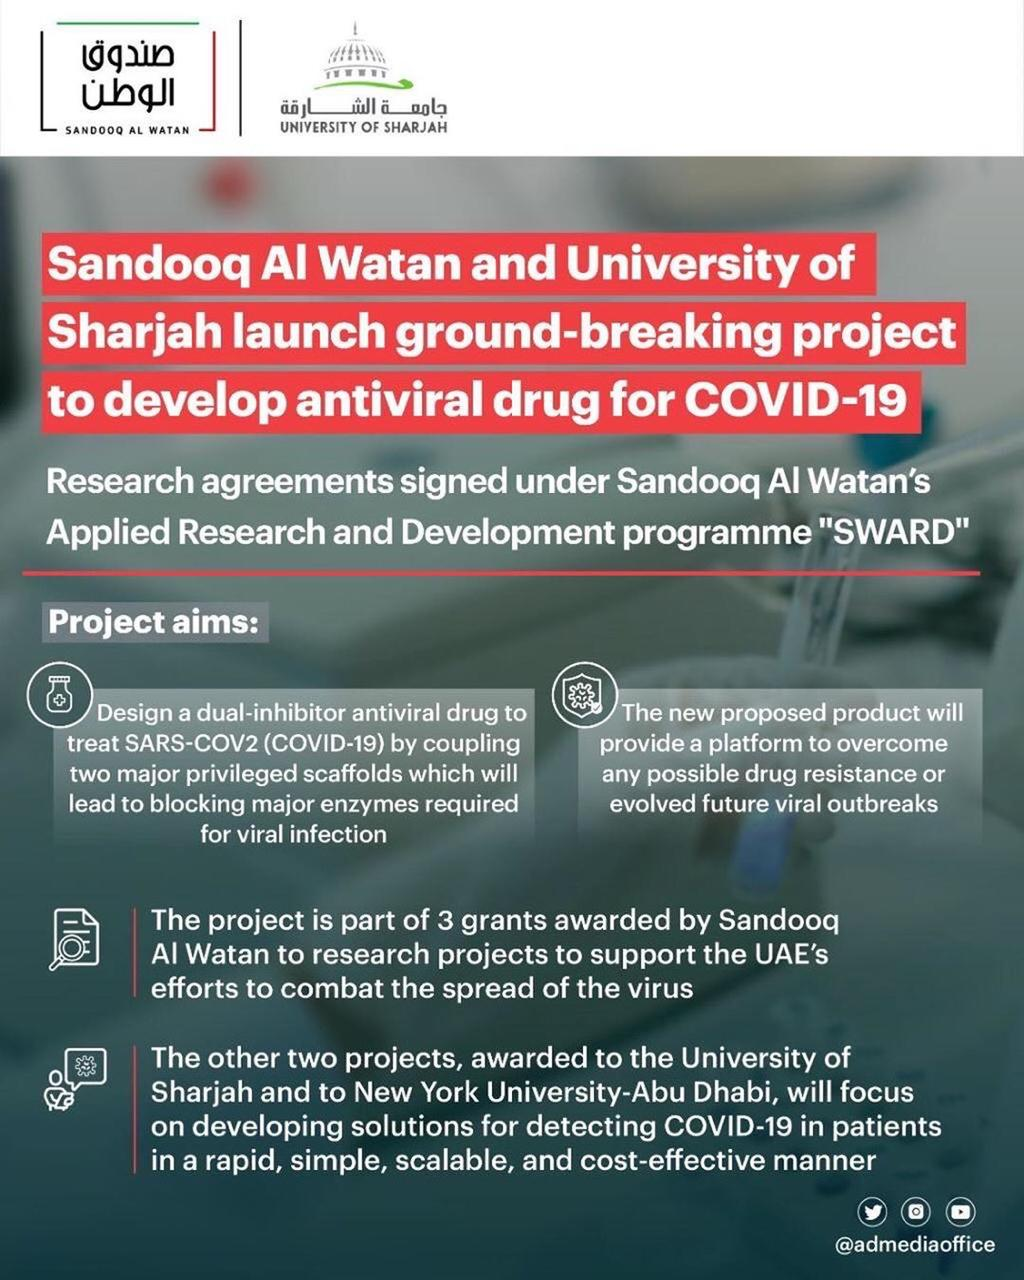 university-of-sharjah-sandooq-al-watan-launch-project-to-develop-antiviral-drug-for-covid19